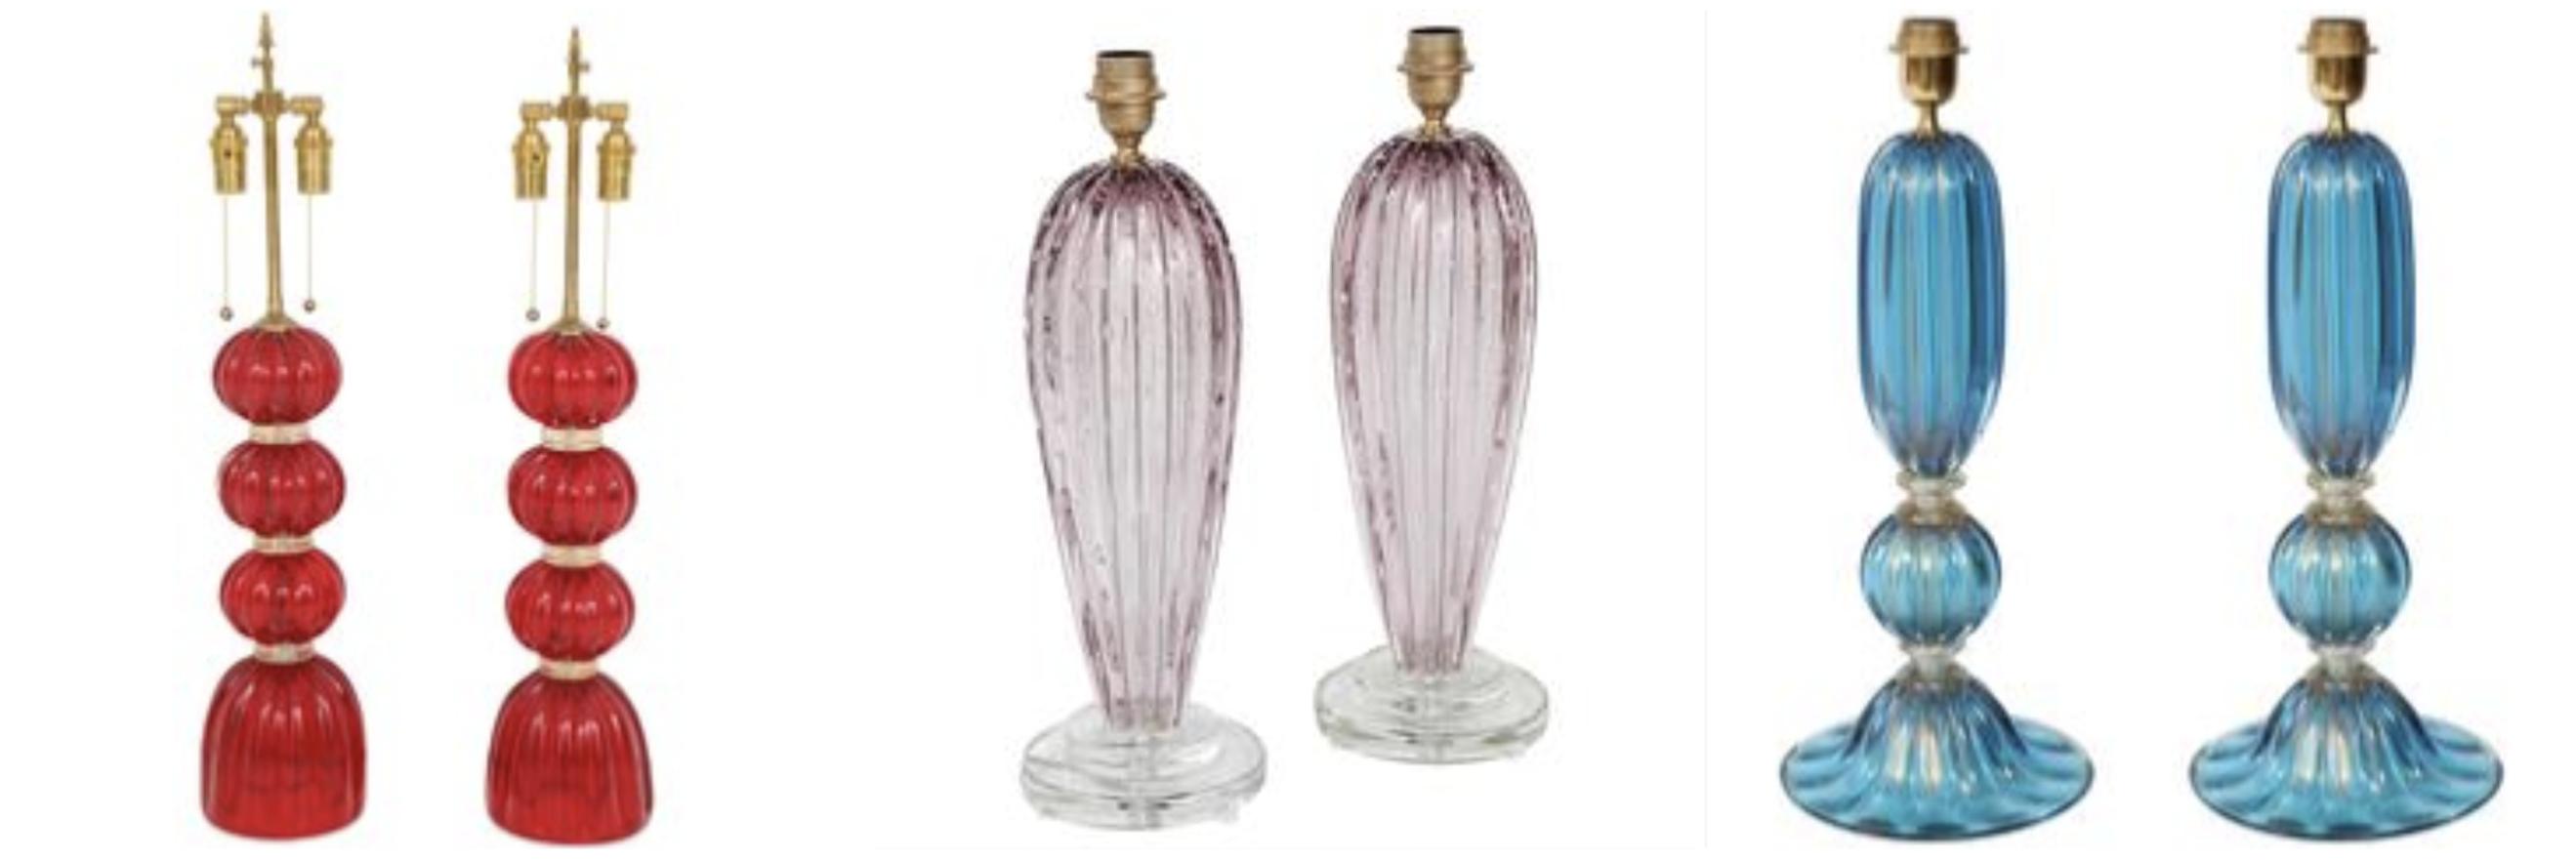 How to Spot Genuine Murano Glass